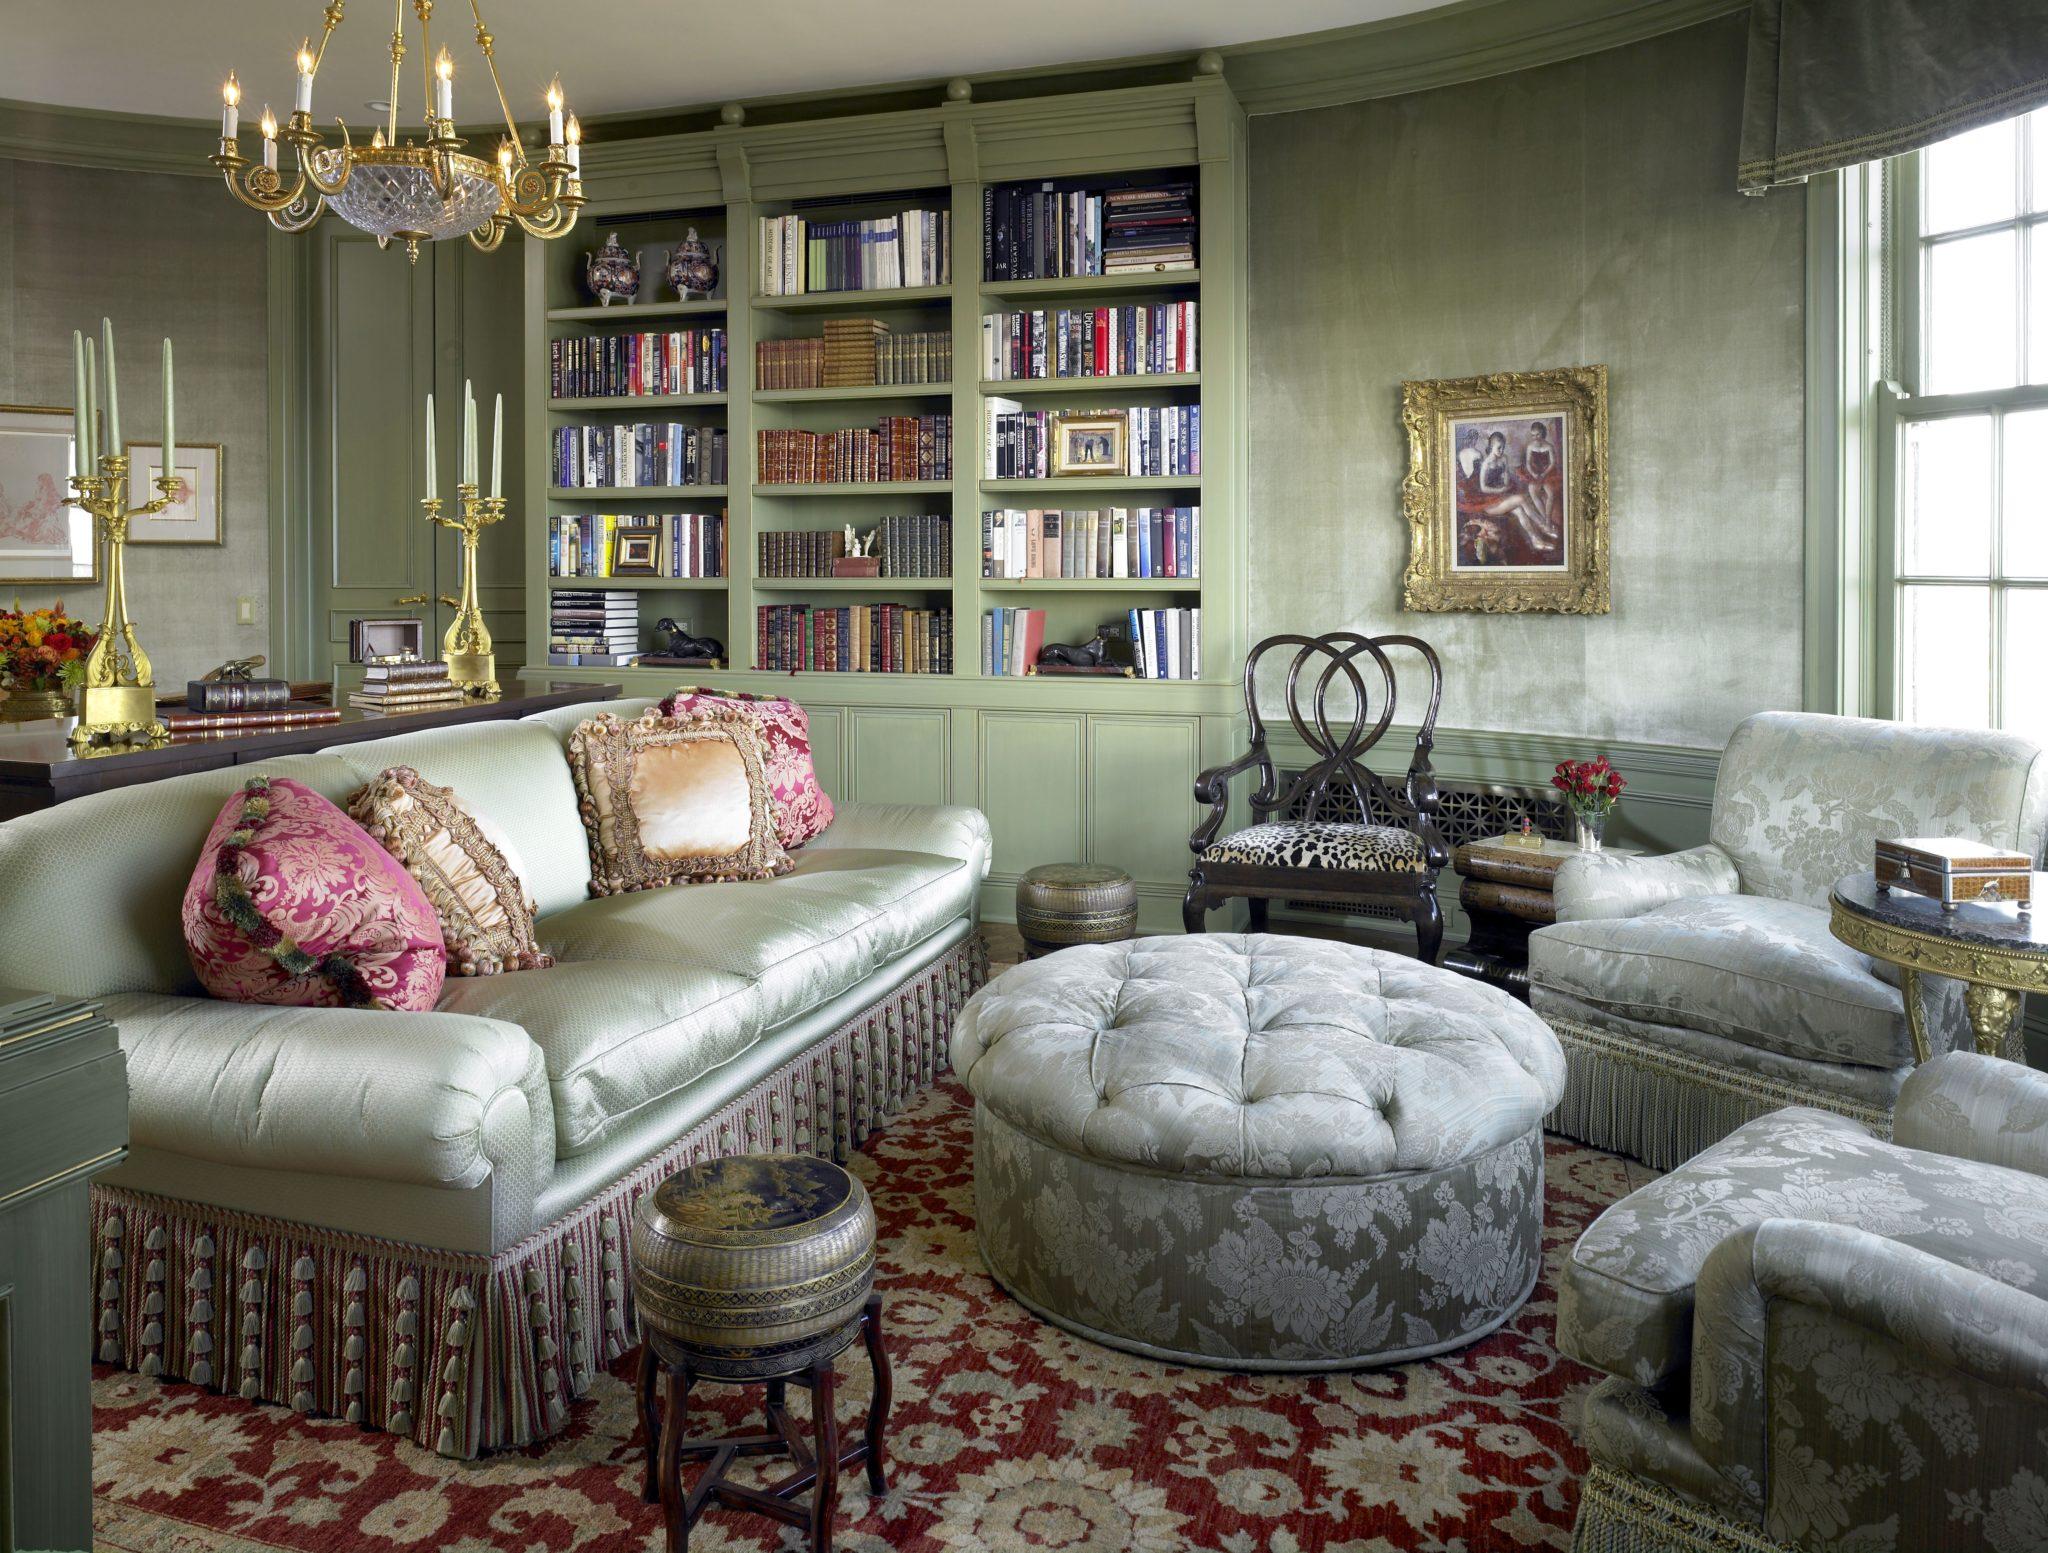 Interior design byGibbons, Fortman & Associates